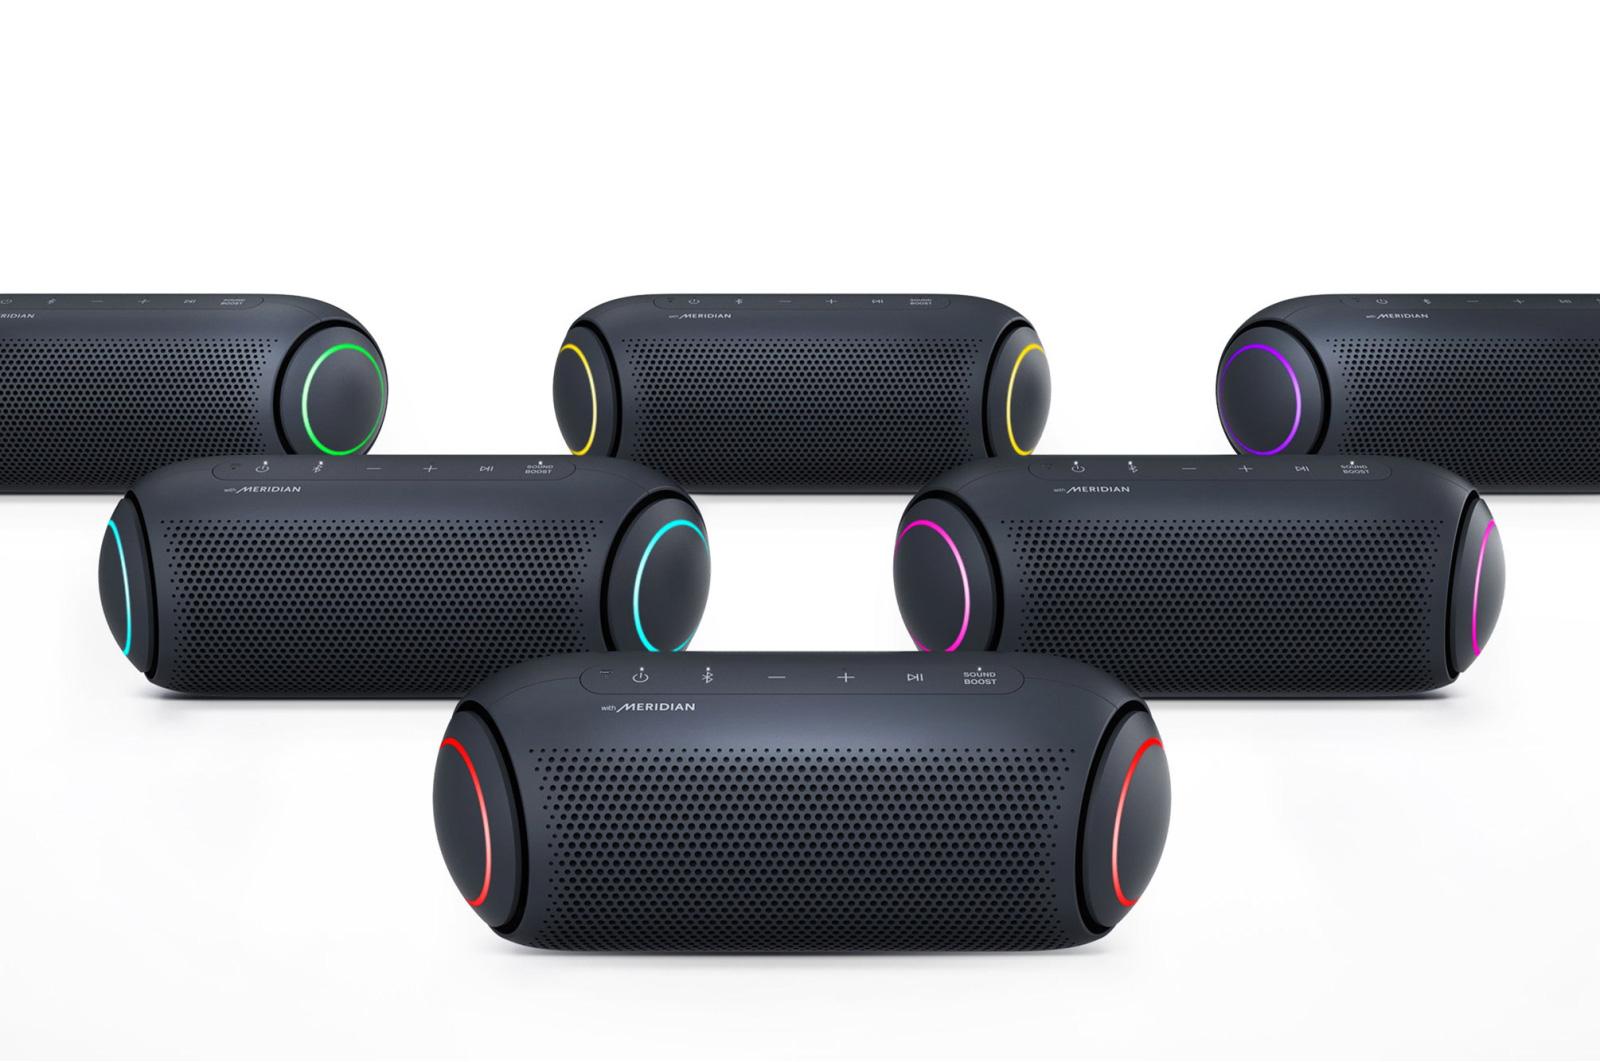 LG XBOOMGo Test Etkinliği